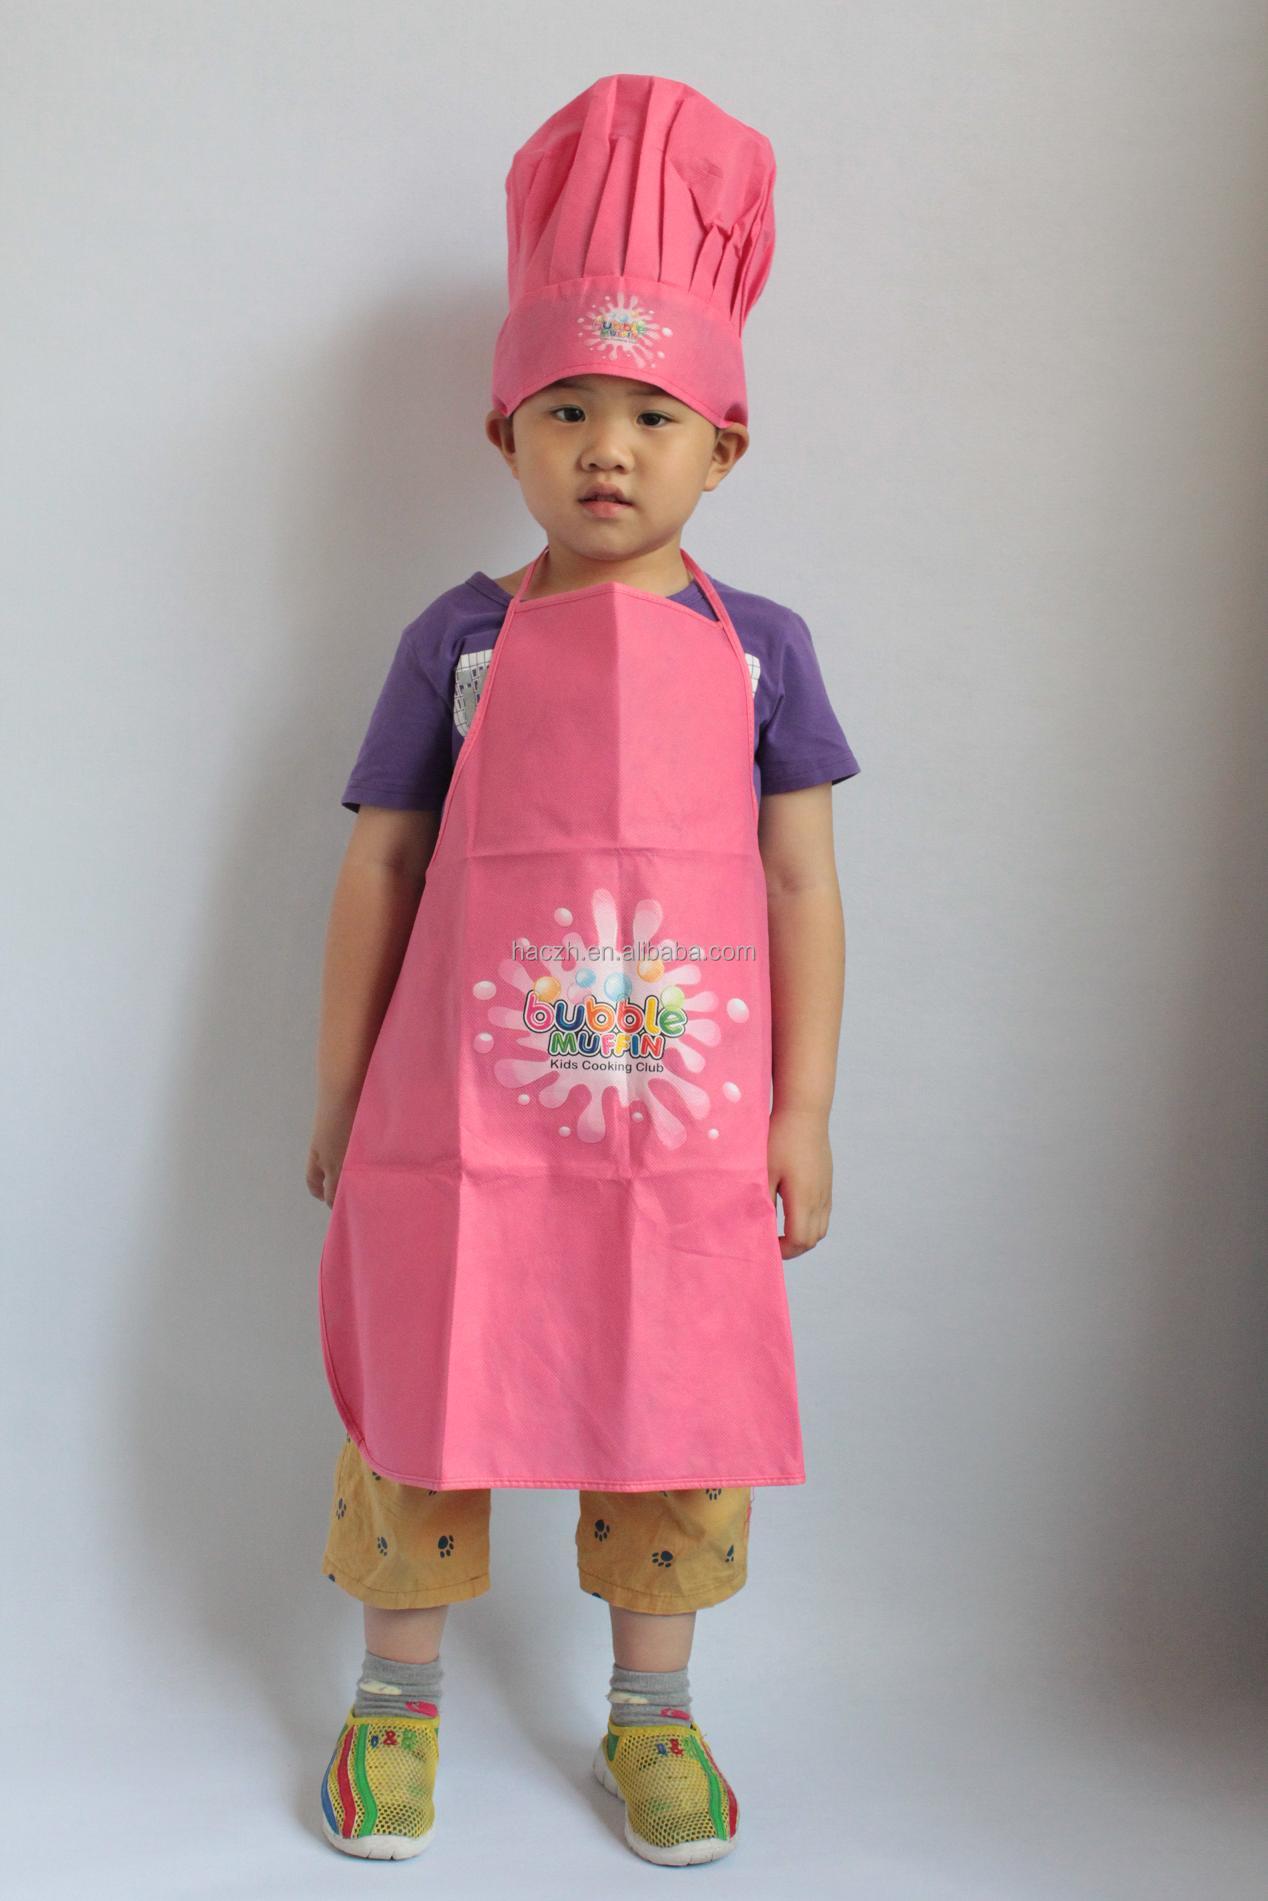 disposable kitchen apron for kids disposable children painting apron rh alibaba com